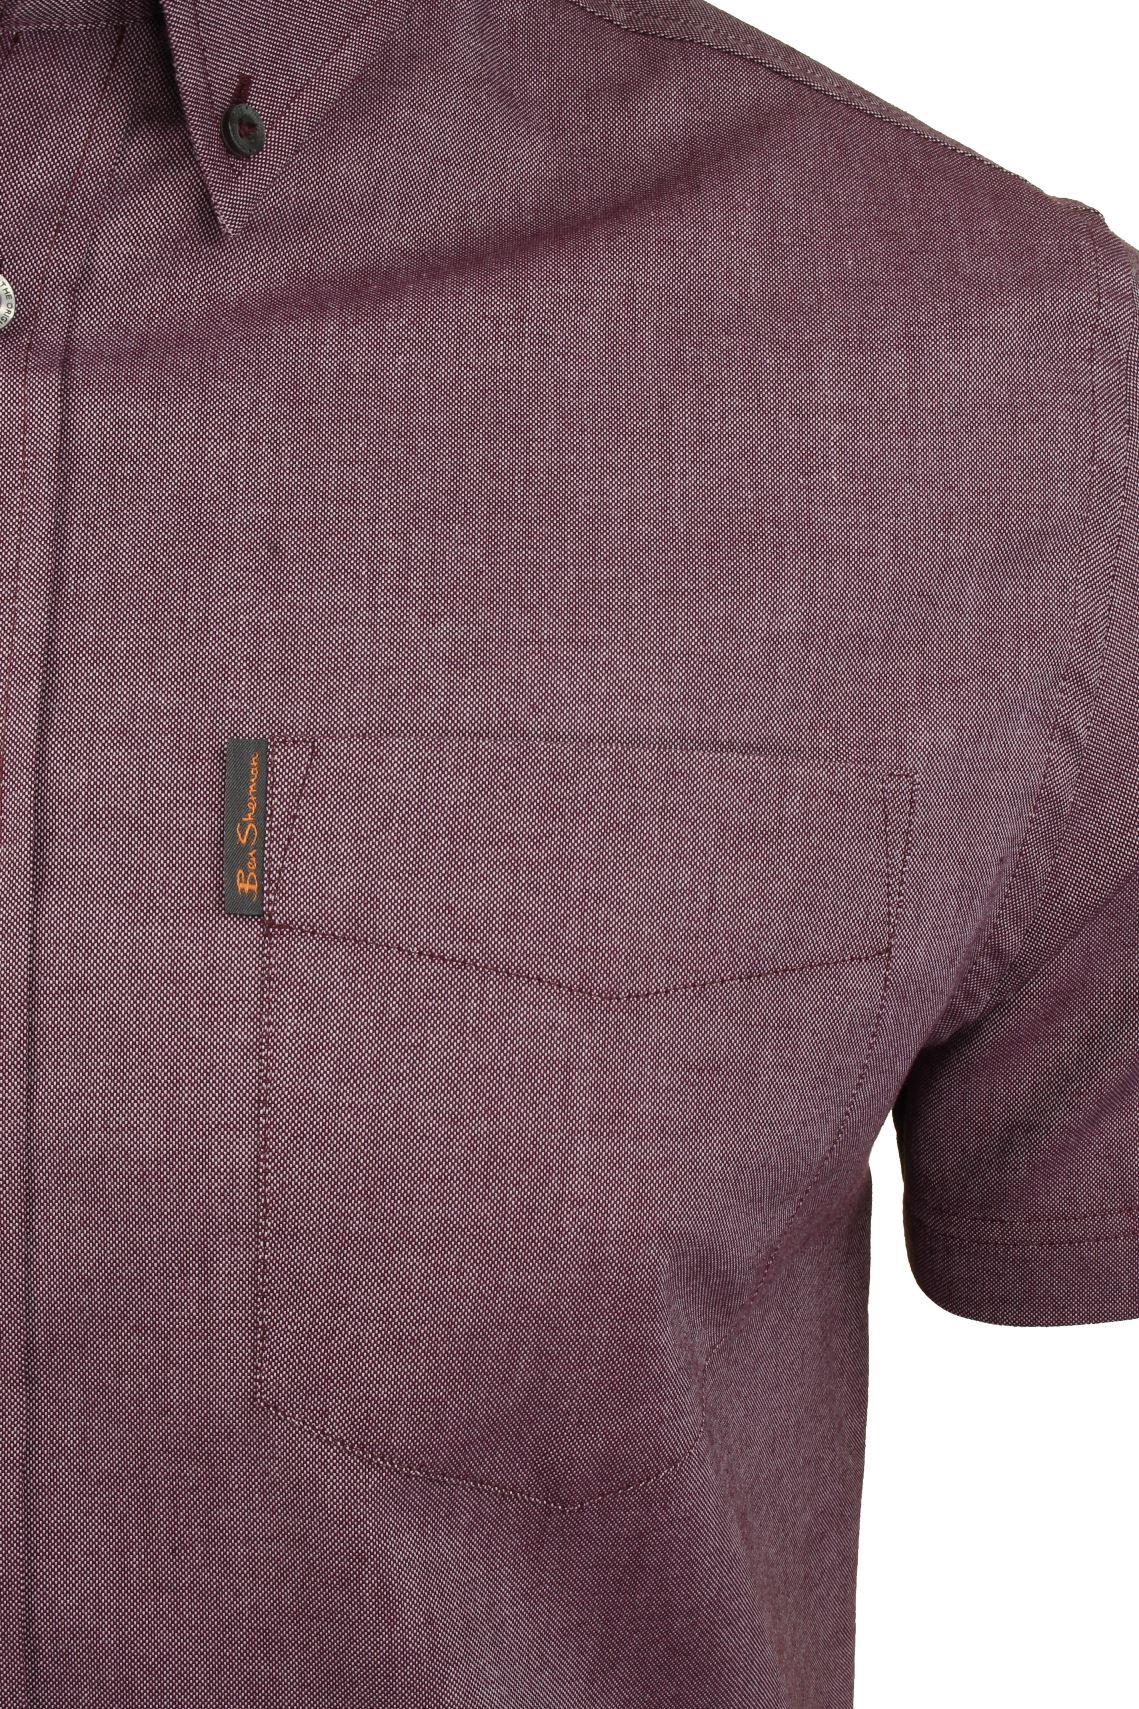 Ben-Sherman-Mens-Oxford-Shirt-Short-Sleeve thumbnail 50